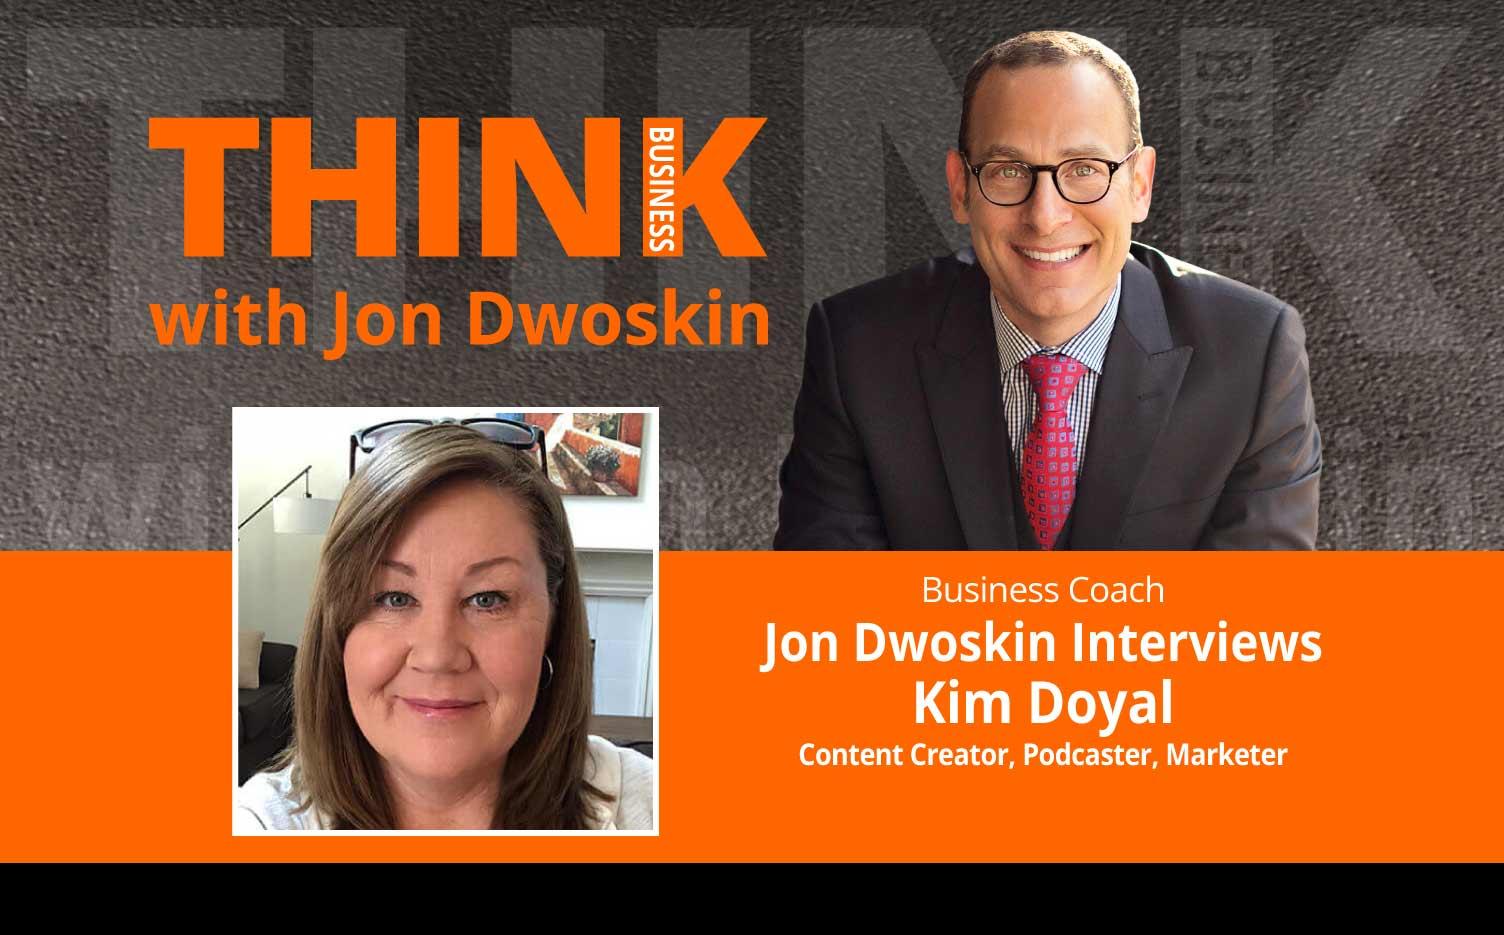 THINK Business Podcast: Jon Dwoskin Interviews Kim Doyal, Content Creator, Podcaster, Marketer